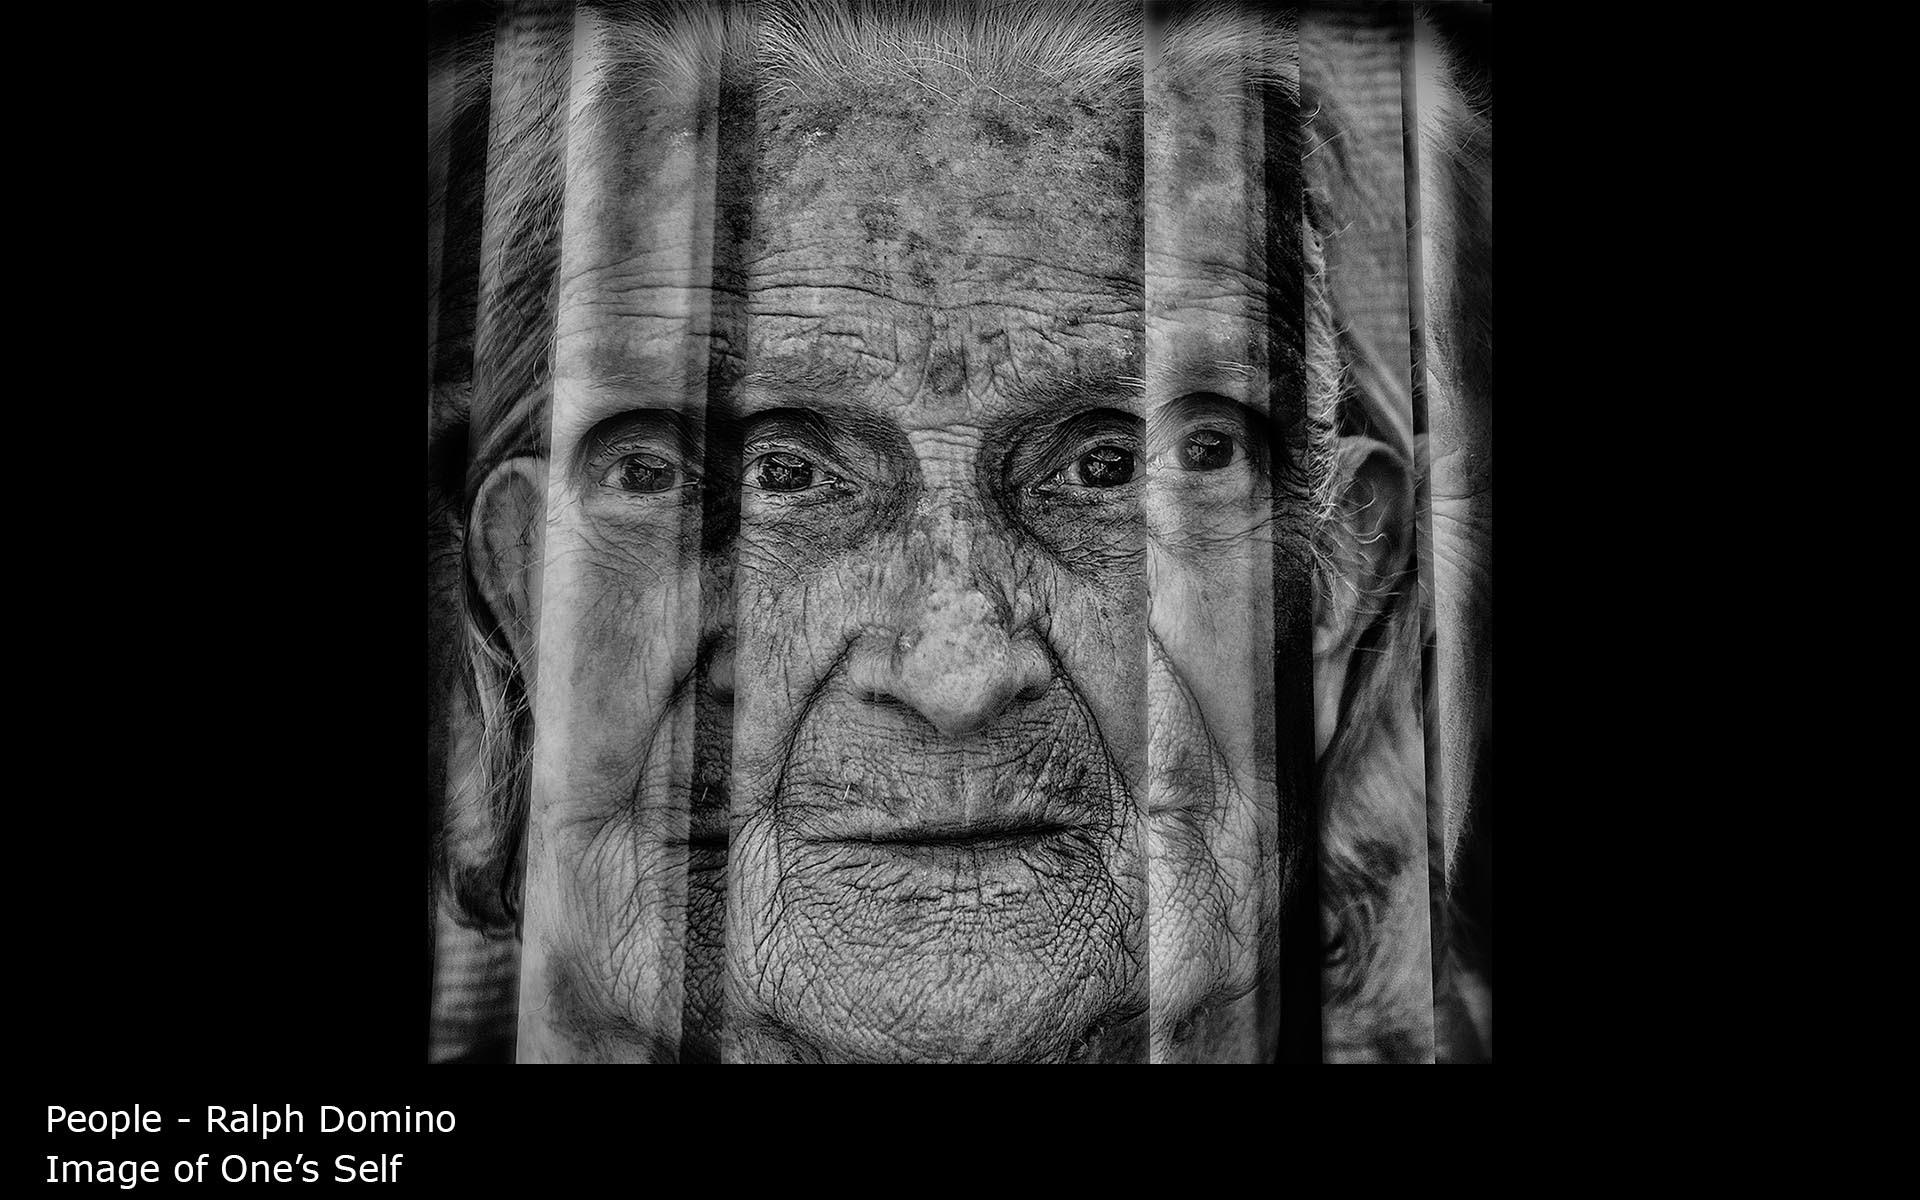 Image of One's Self - Ralph Domino